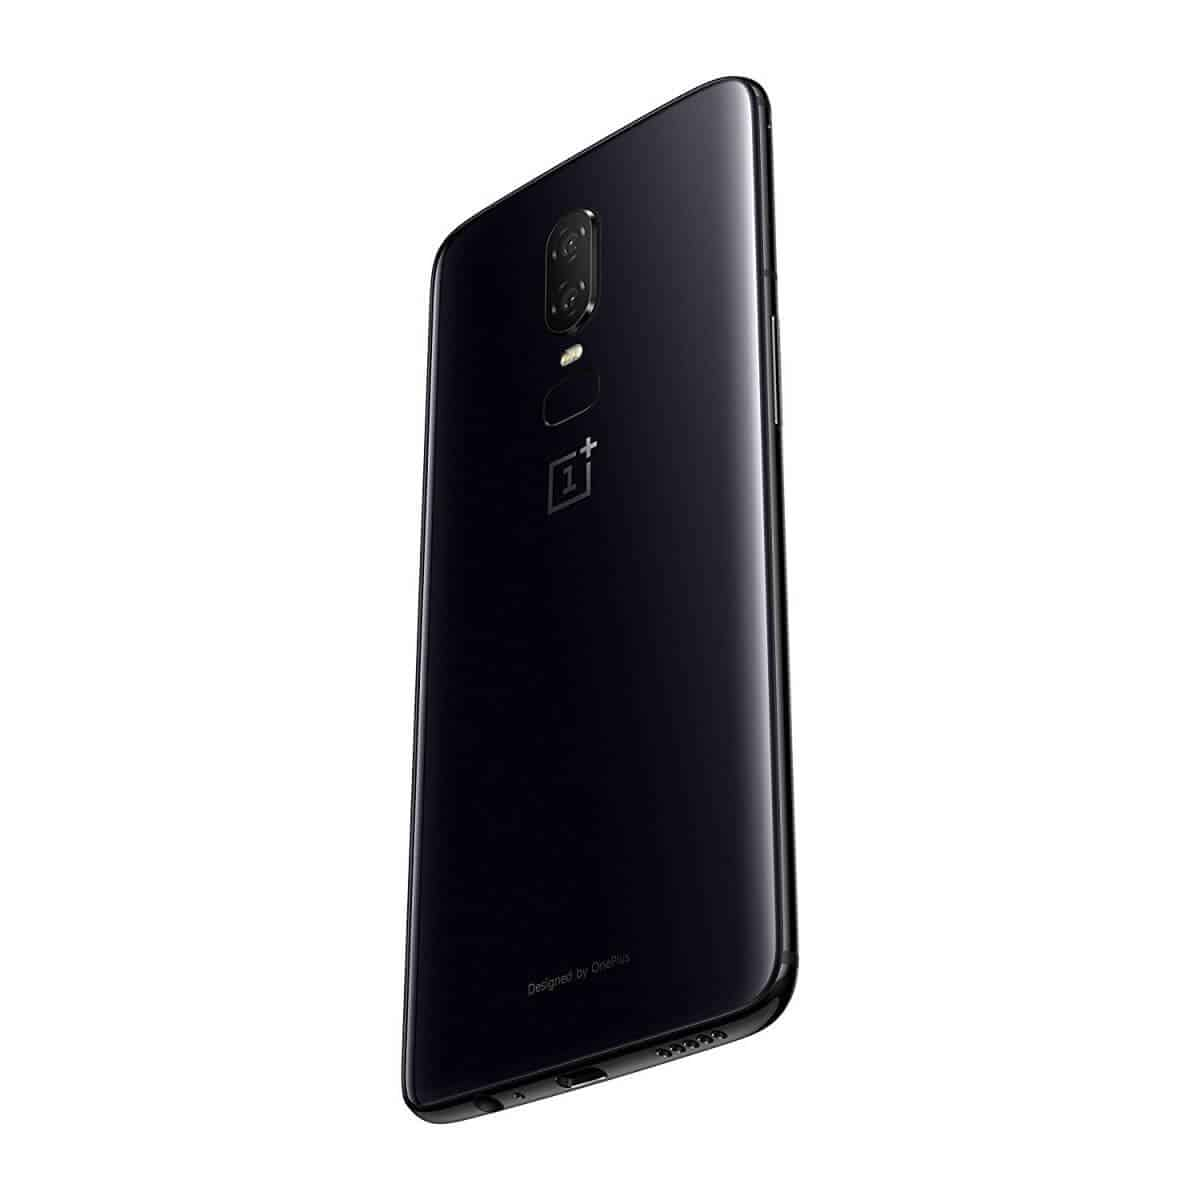 OnePlus 6 Mirror Black 4